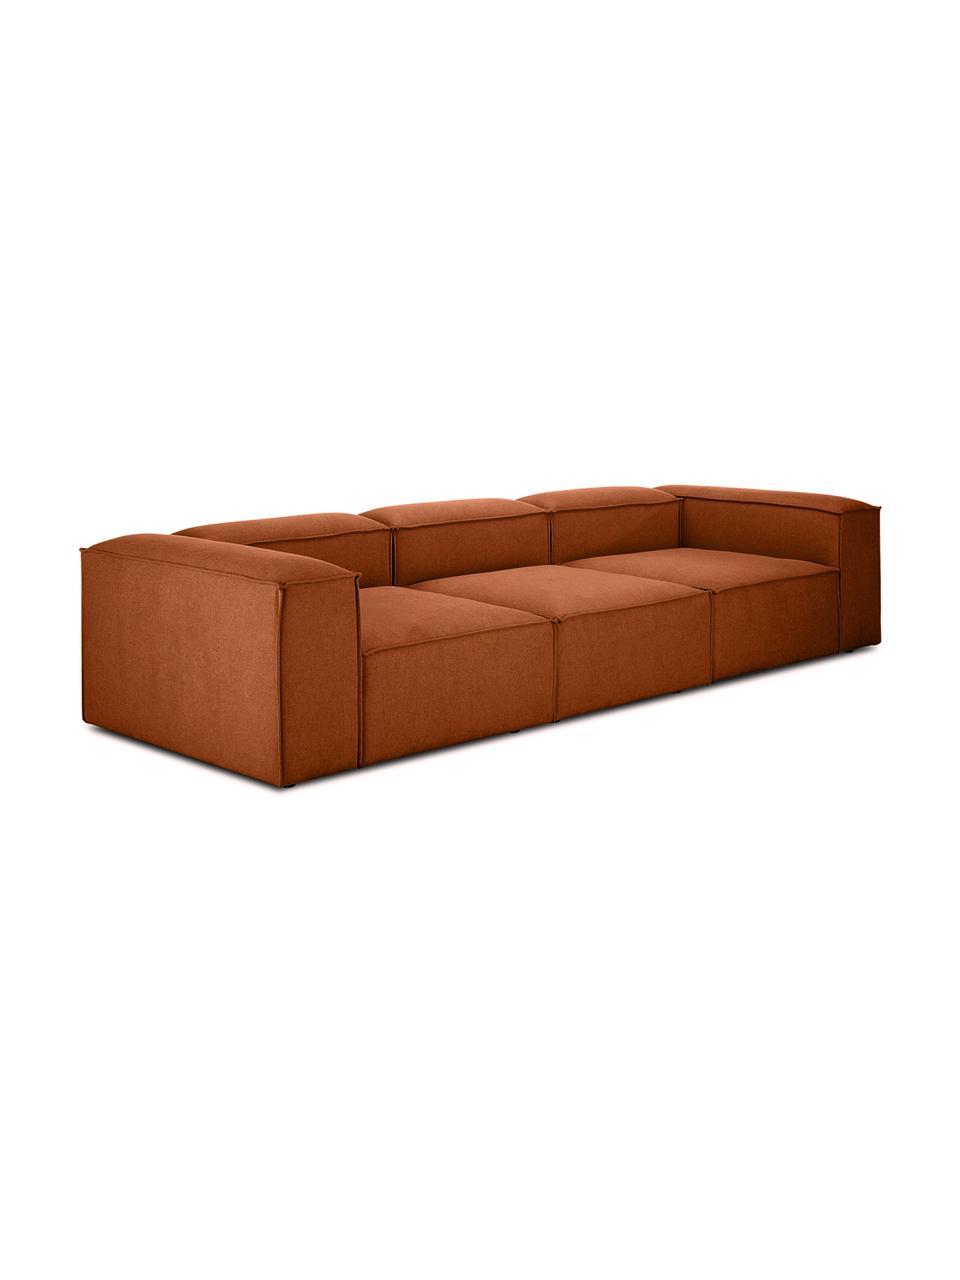 Modulares Sofa Lennon (4-Sitzer) in Terrakotta, Bezug: Polyester Der hochwertige, Gestell: Massives Kiefernholz, Spe, Füße: Kunststoff, Webstoff Terrakotta, B 326 x T 119 cm